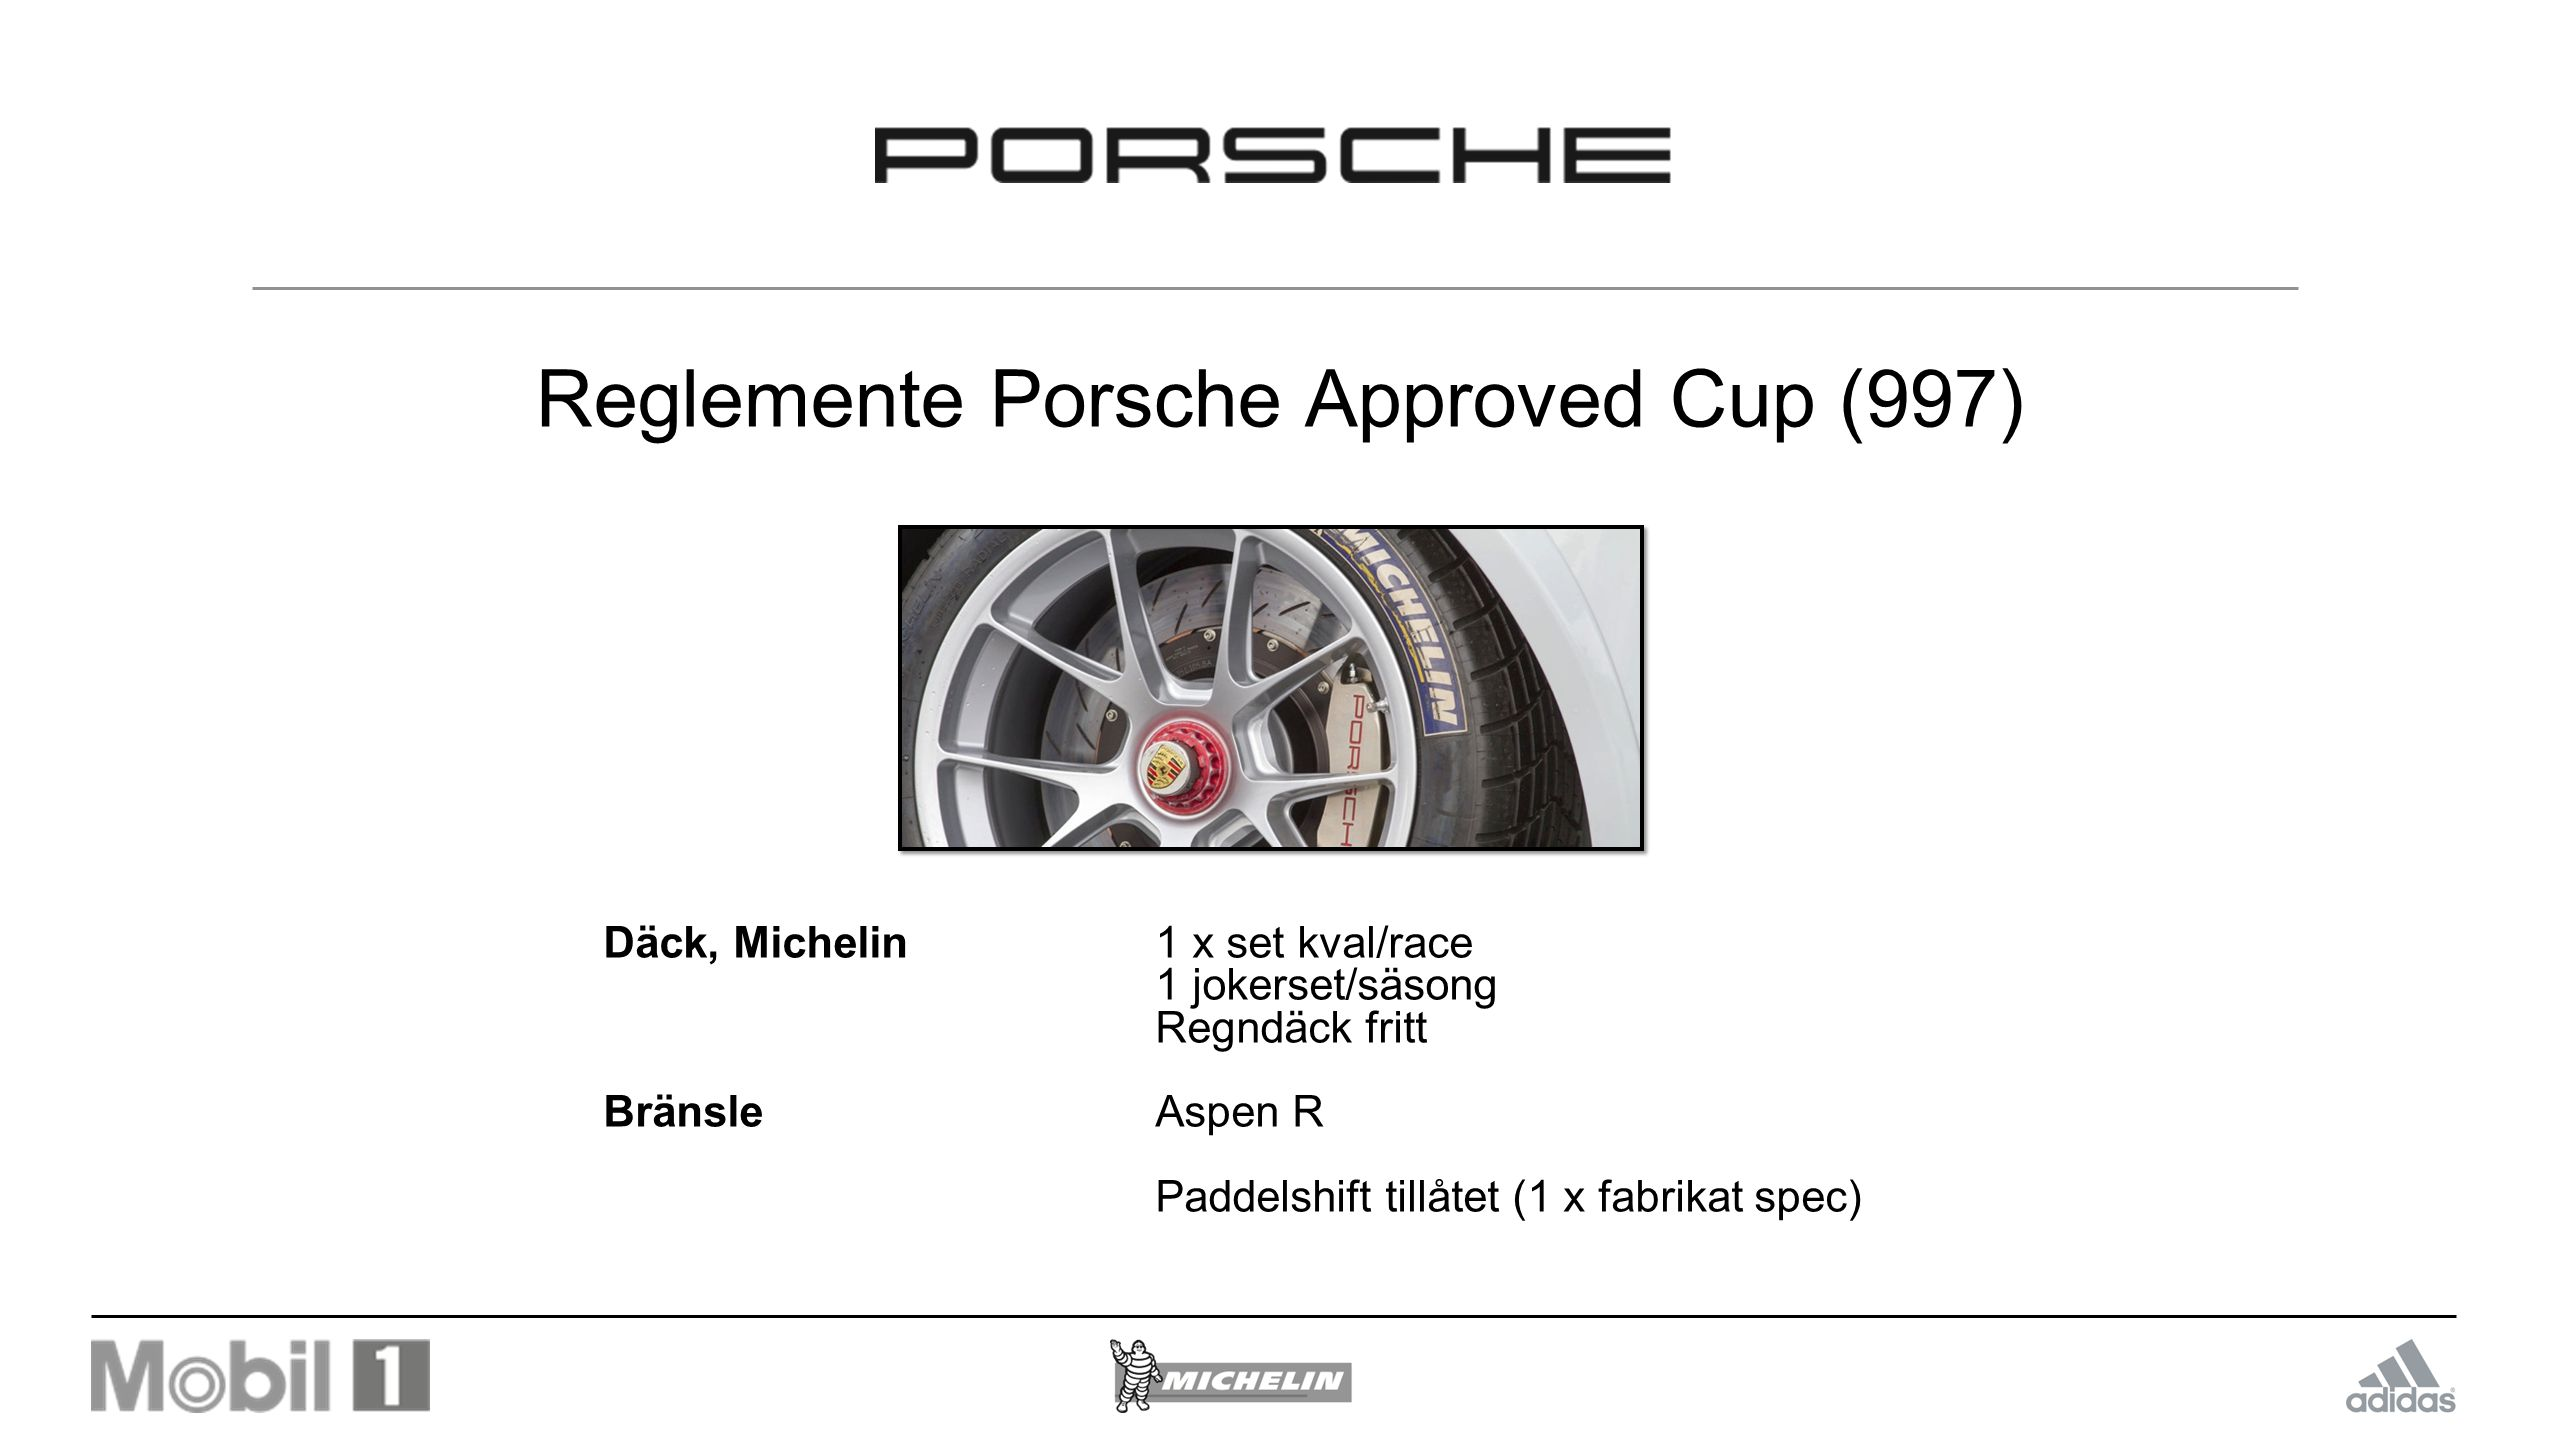 Reglemente Porsche Approved Cup (997)